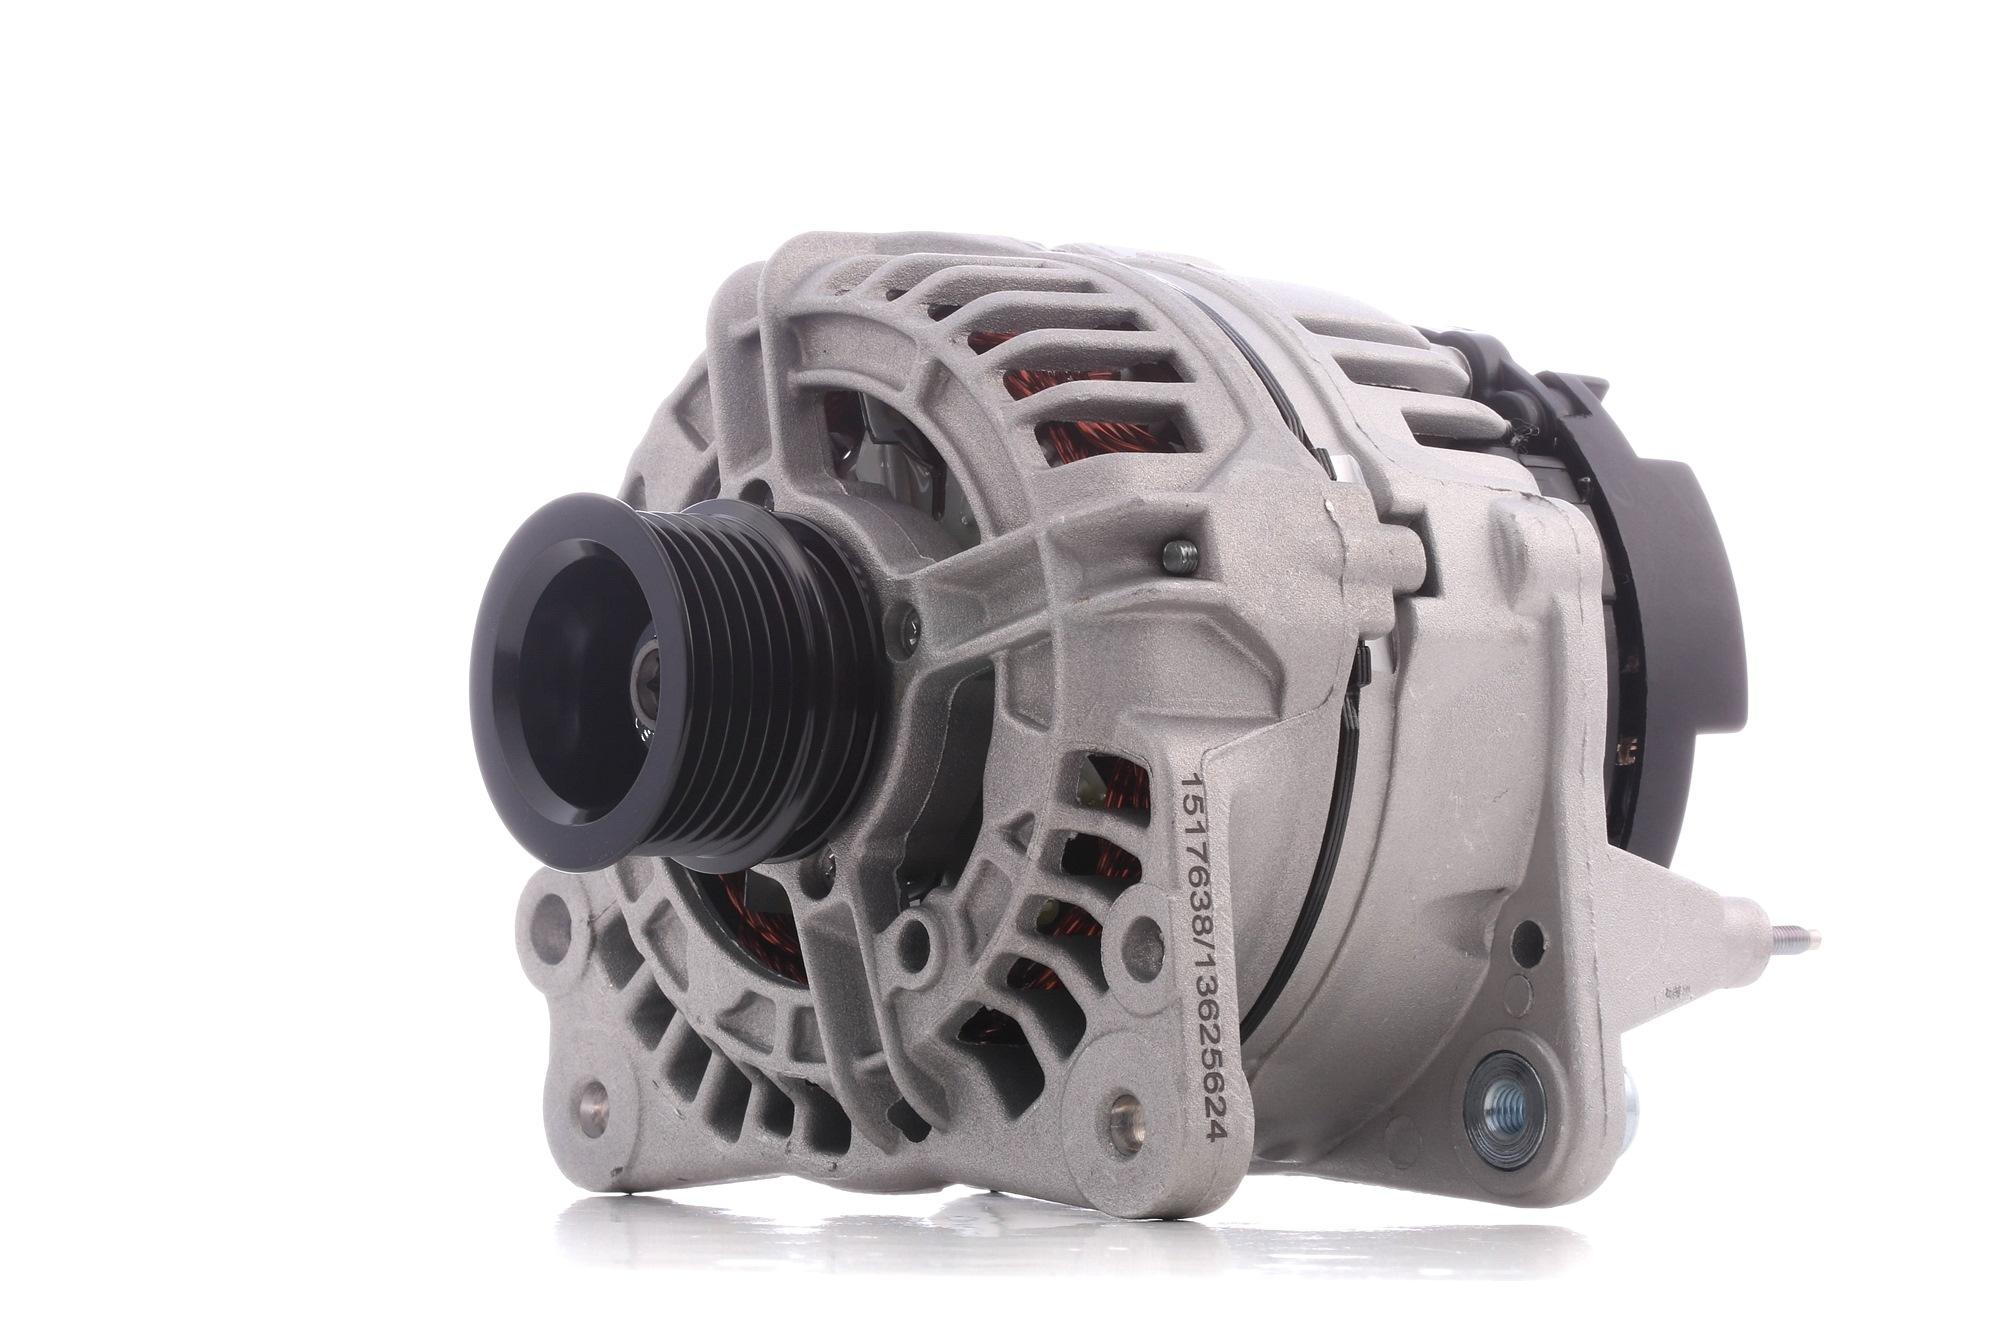 ridex Dynamo VW,AUDI,SKODA 4G0073 038903018AX,047903018A,047903018AX Alternator,Wisselstroomdynamo,Dynamo / Alternator 37903025M,37903025T,38903018A